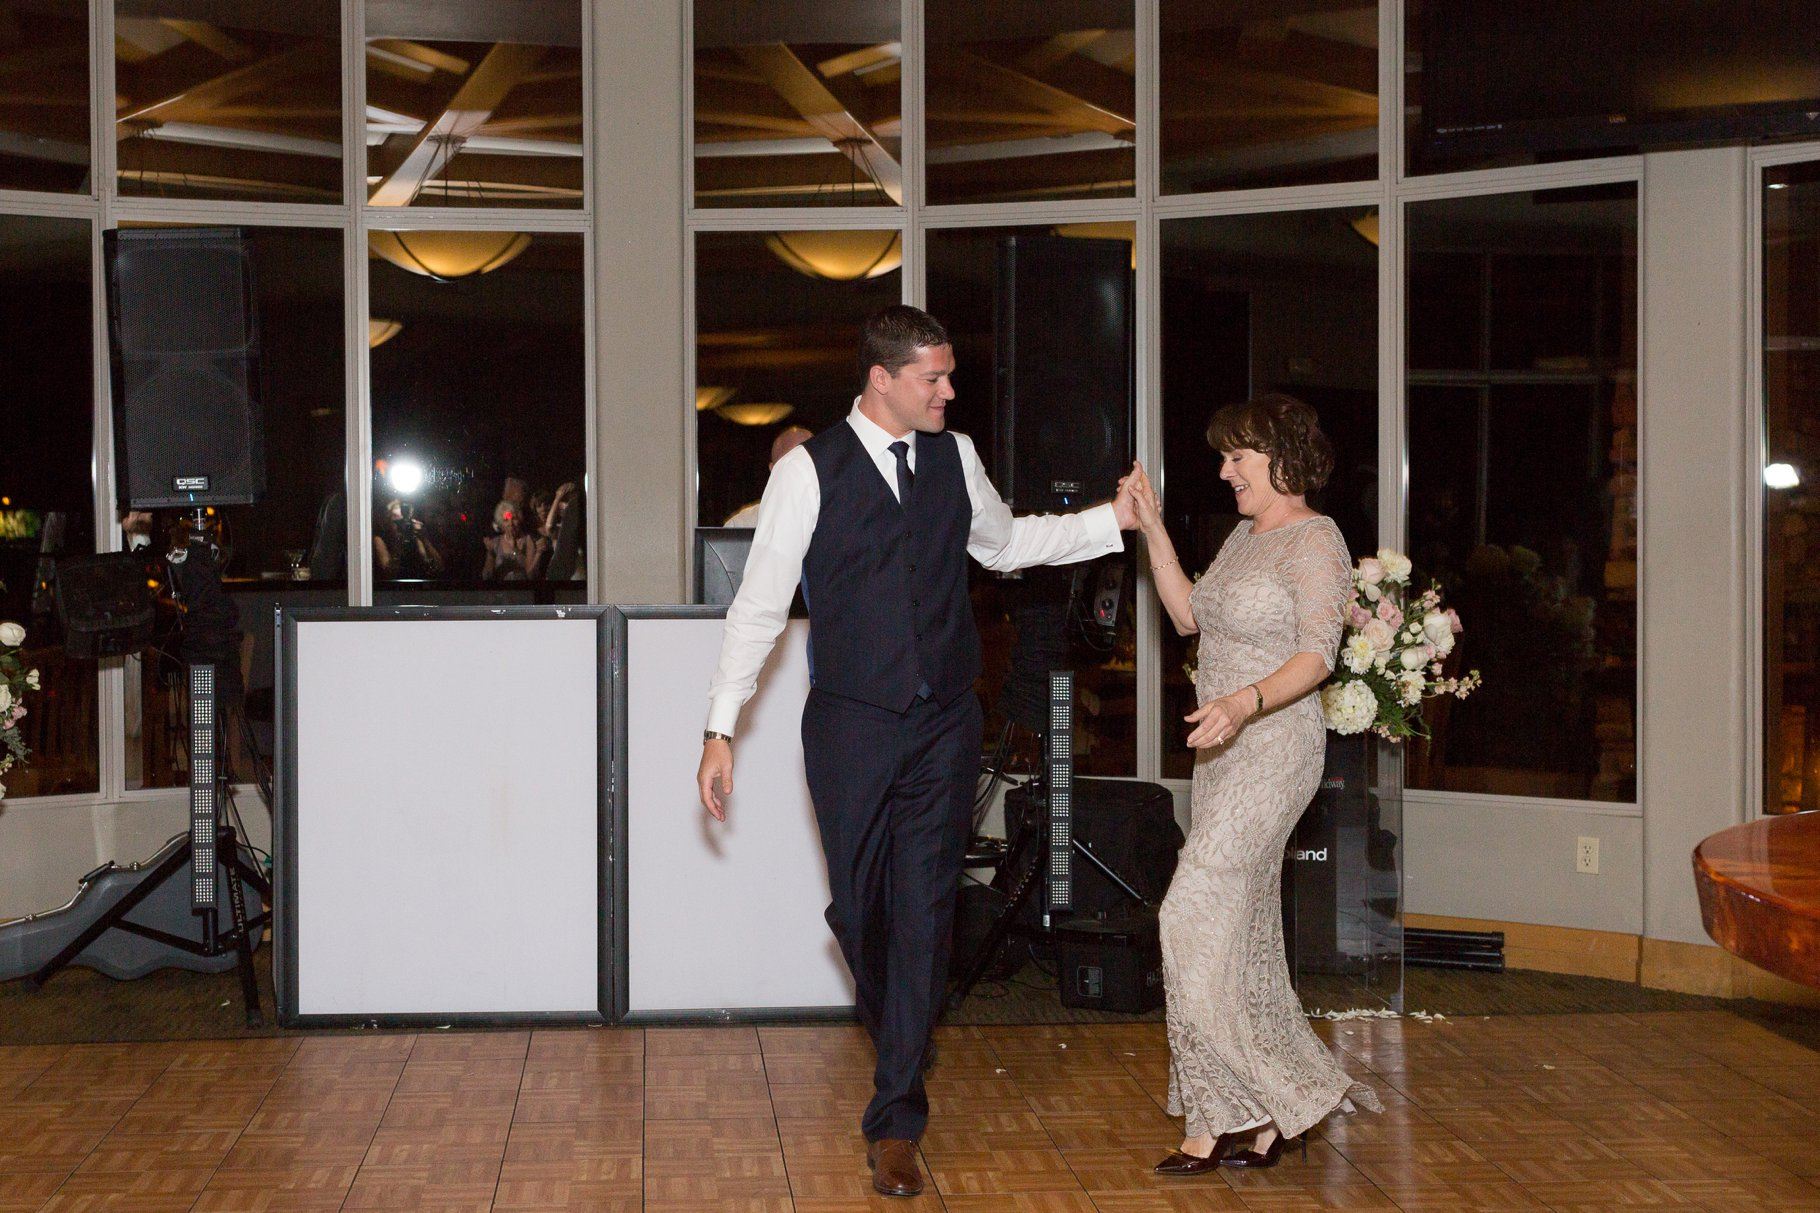 sedona wedding-510_GRETCHEN WAKEMAN PHOTOGRAPHY.jpg